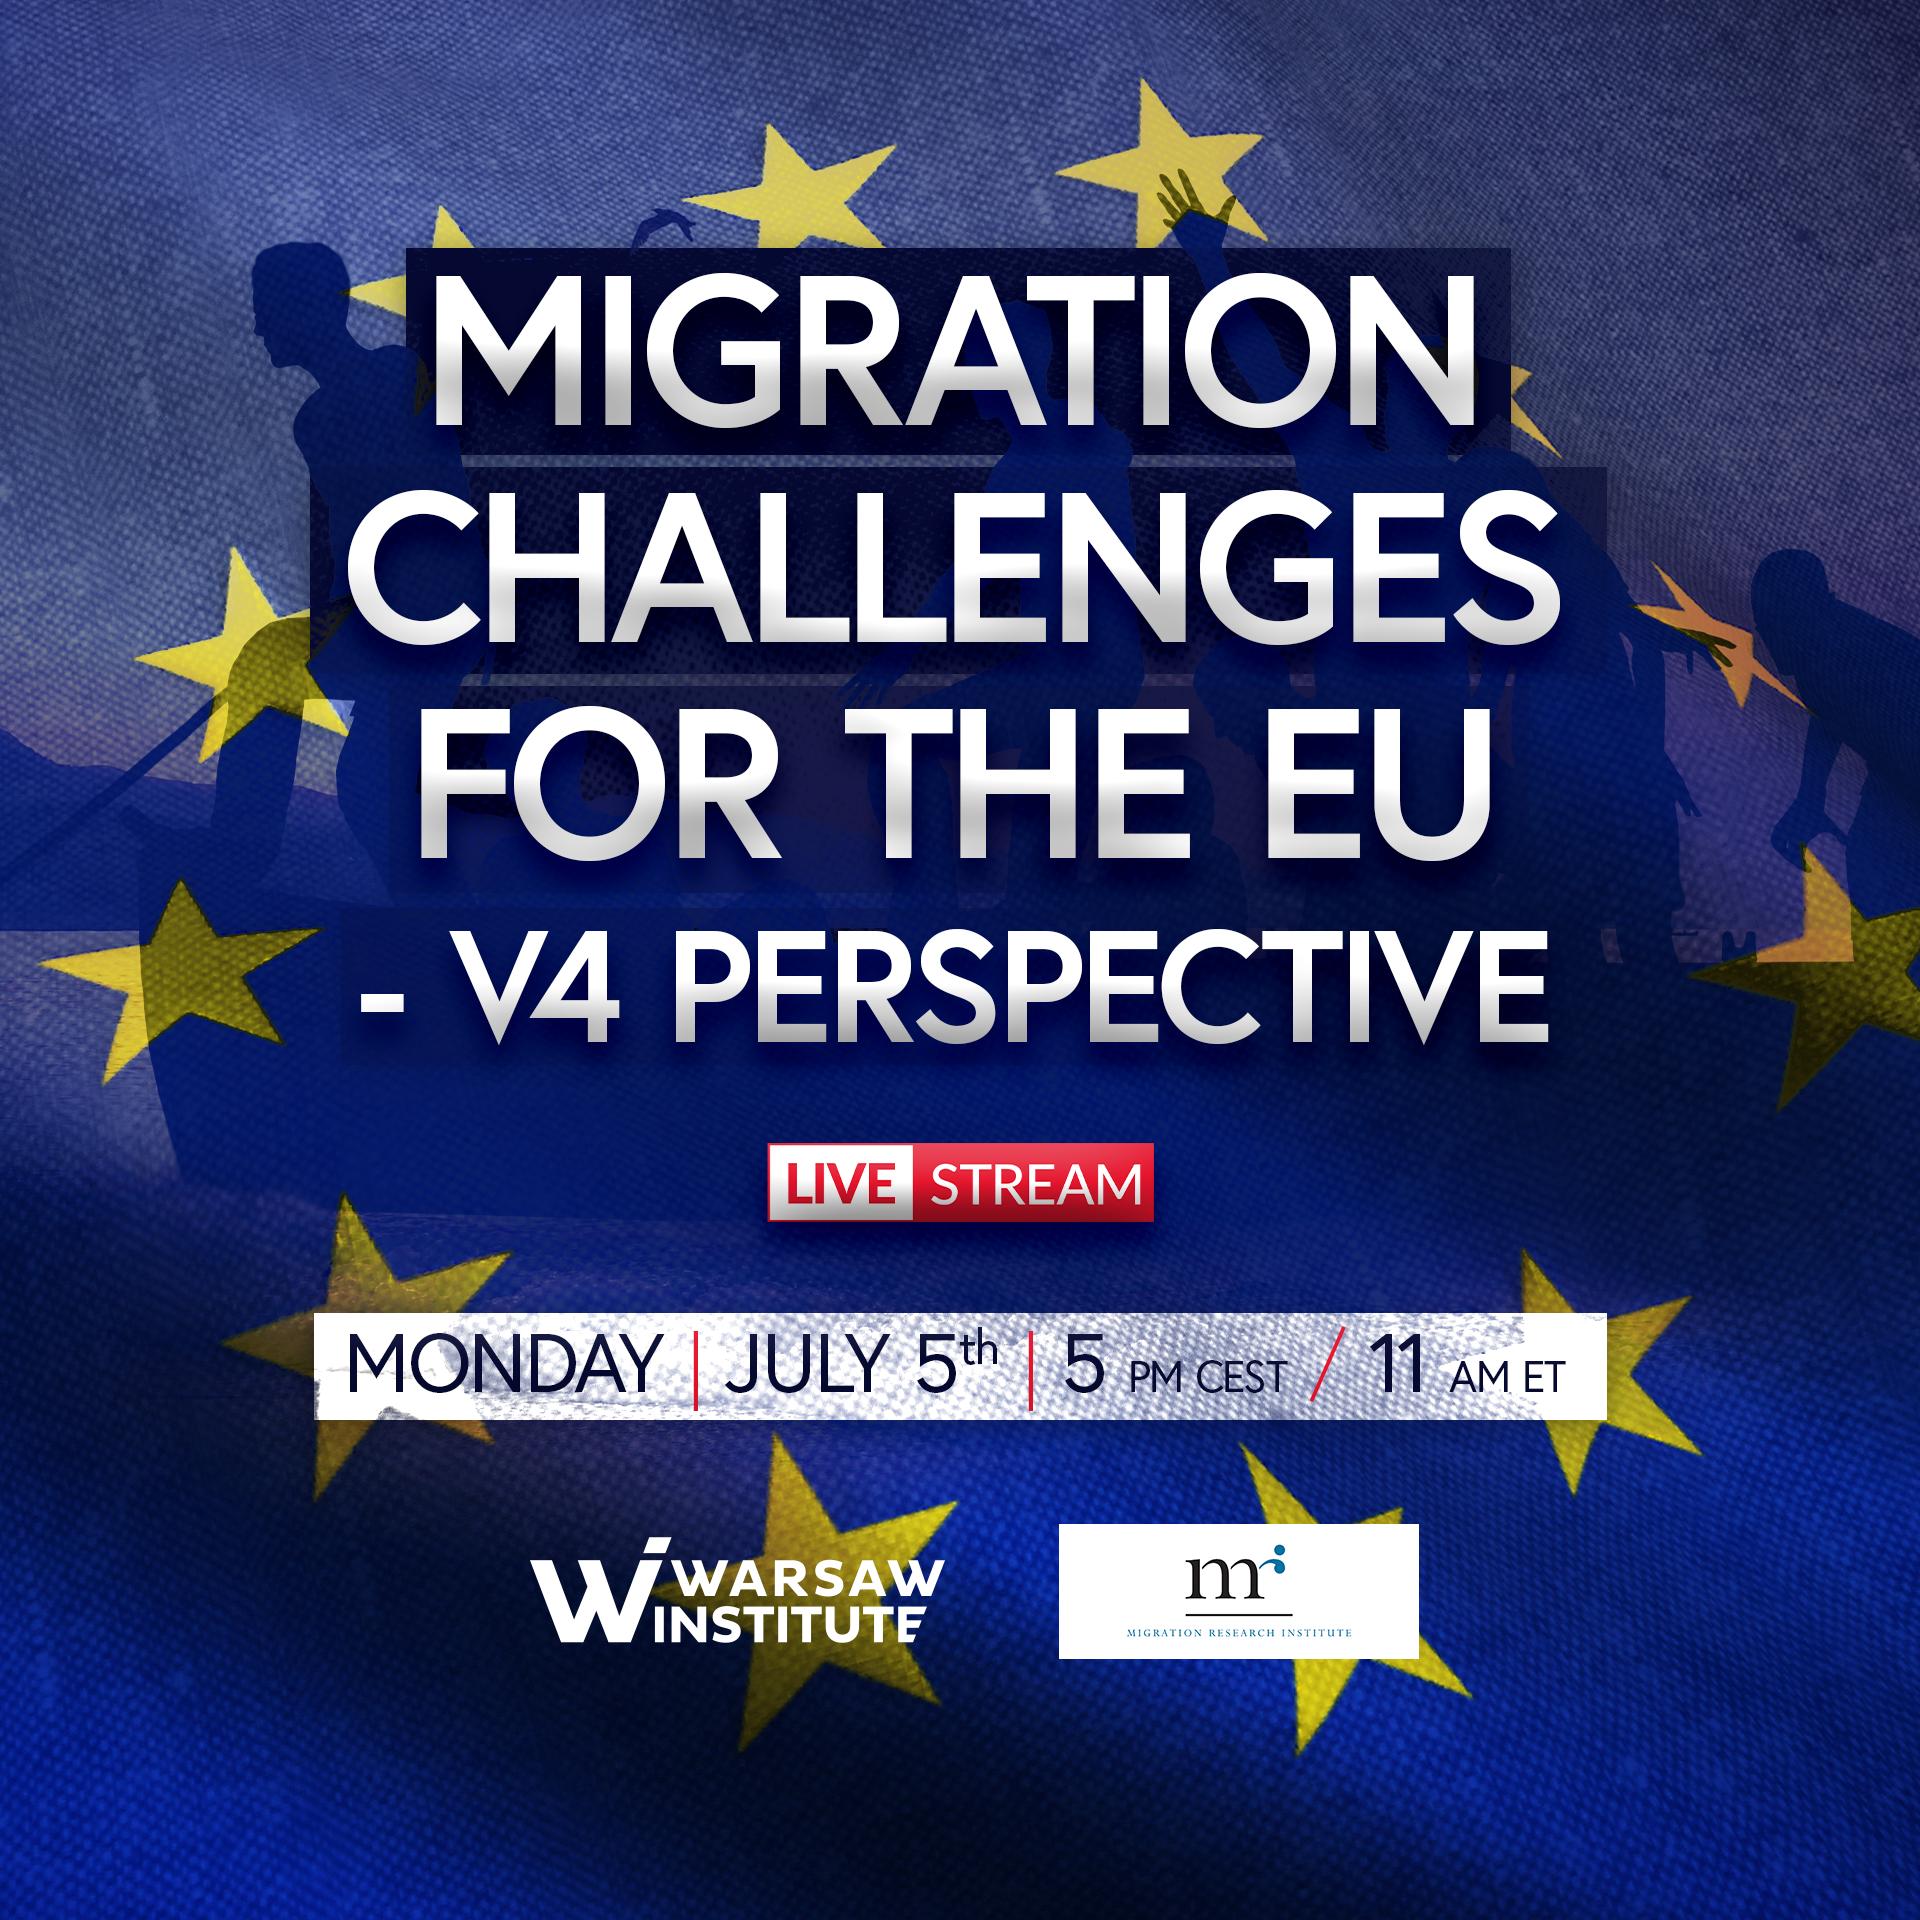 Migration Challenges for the EU – V4 Perspective